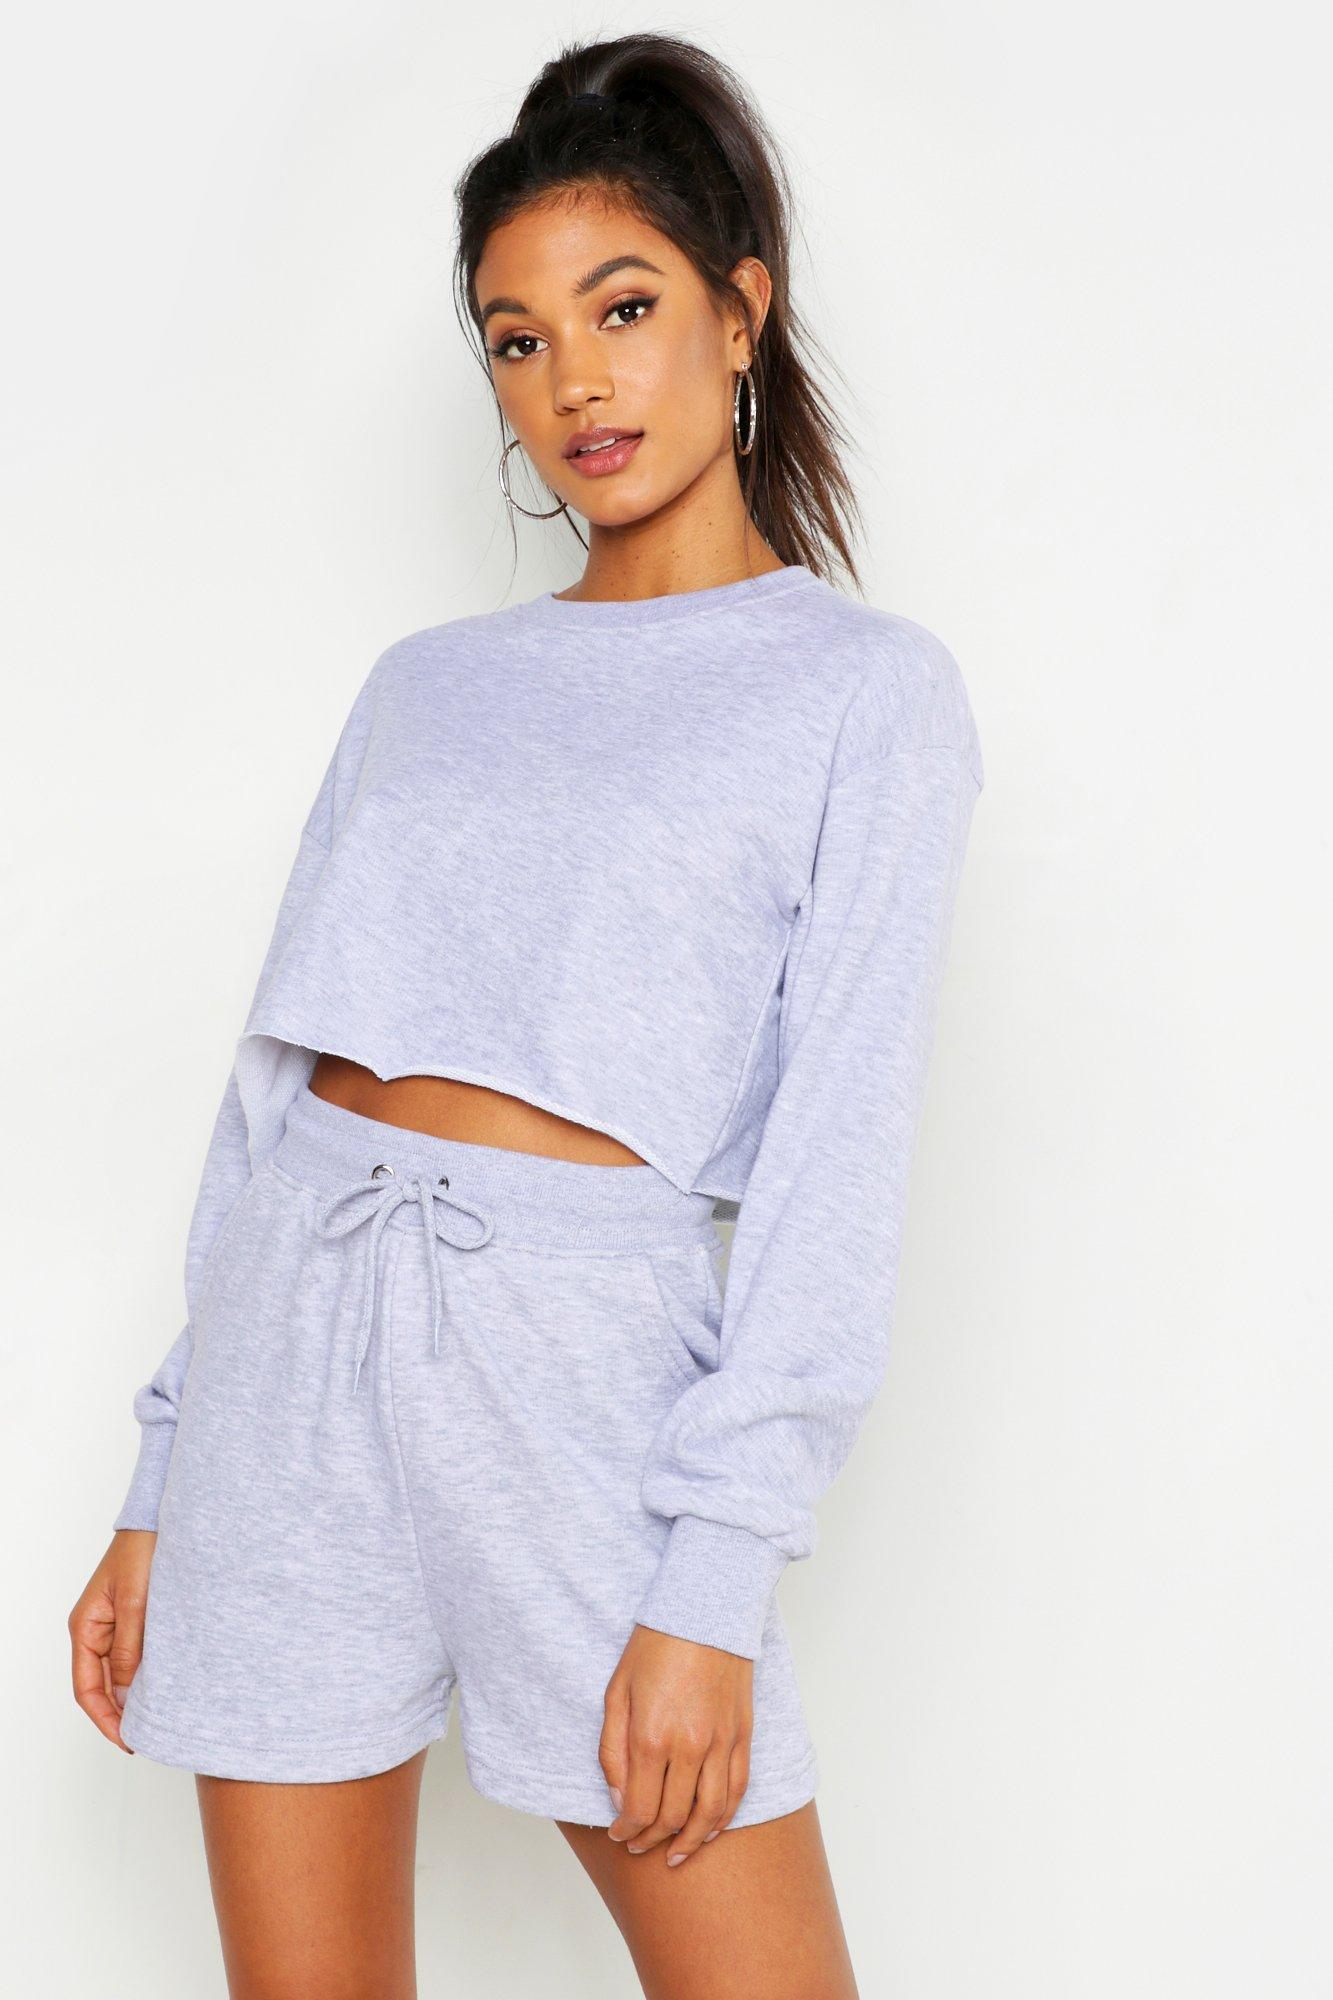 Womens Weiches, kurzes Sweatshirt aus Loopback-Stoff - Grau meliert - 40, Grau Meliert - Boohoo.com